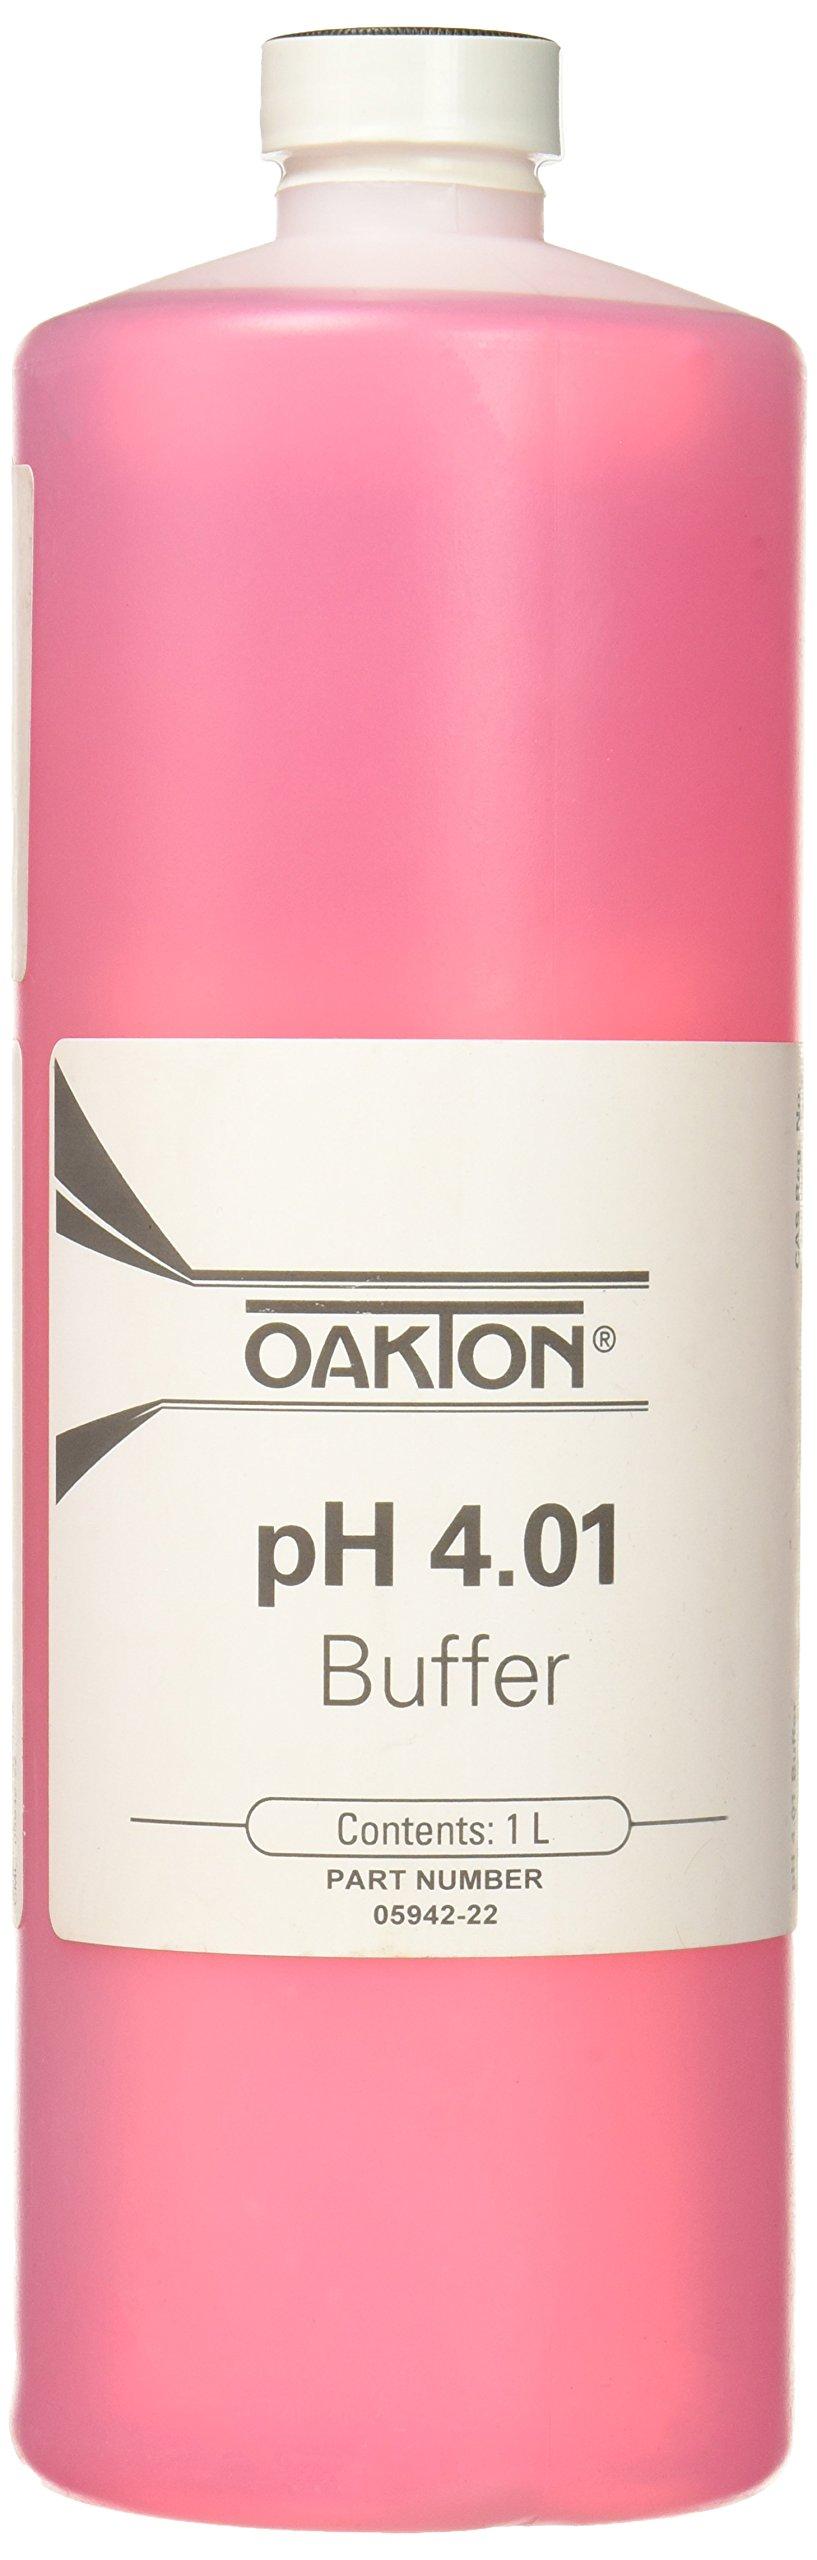 Oakton WD-05942-22 Oakton Calibration Buffer, 4.01 Standard, 1 L Capacity